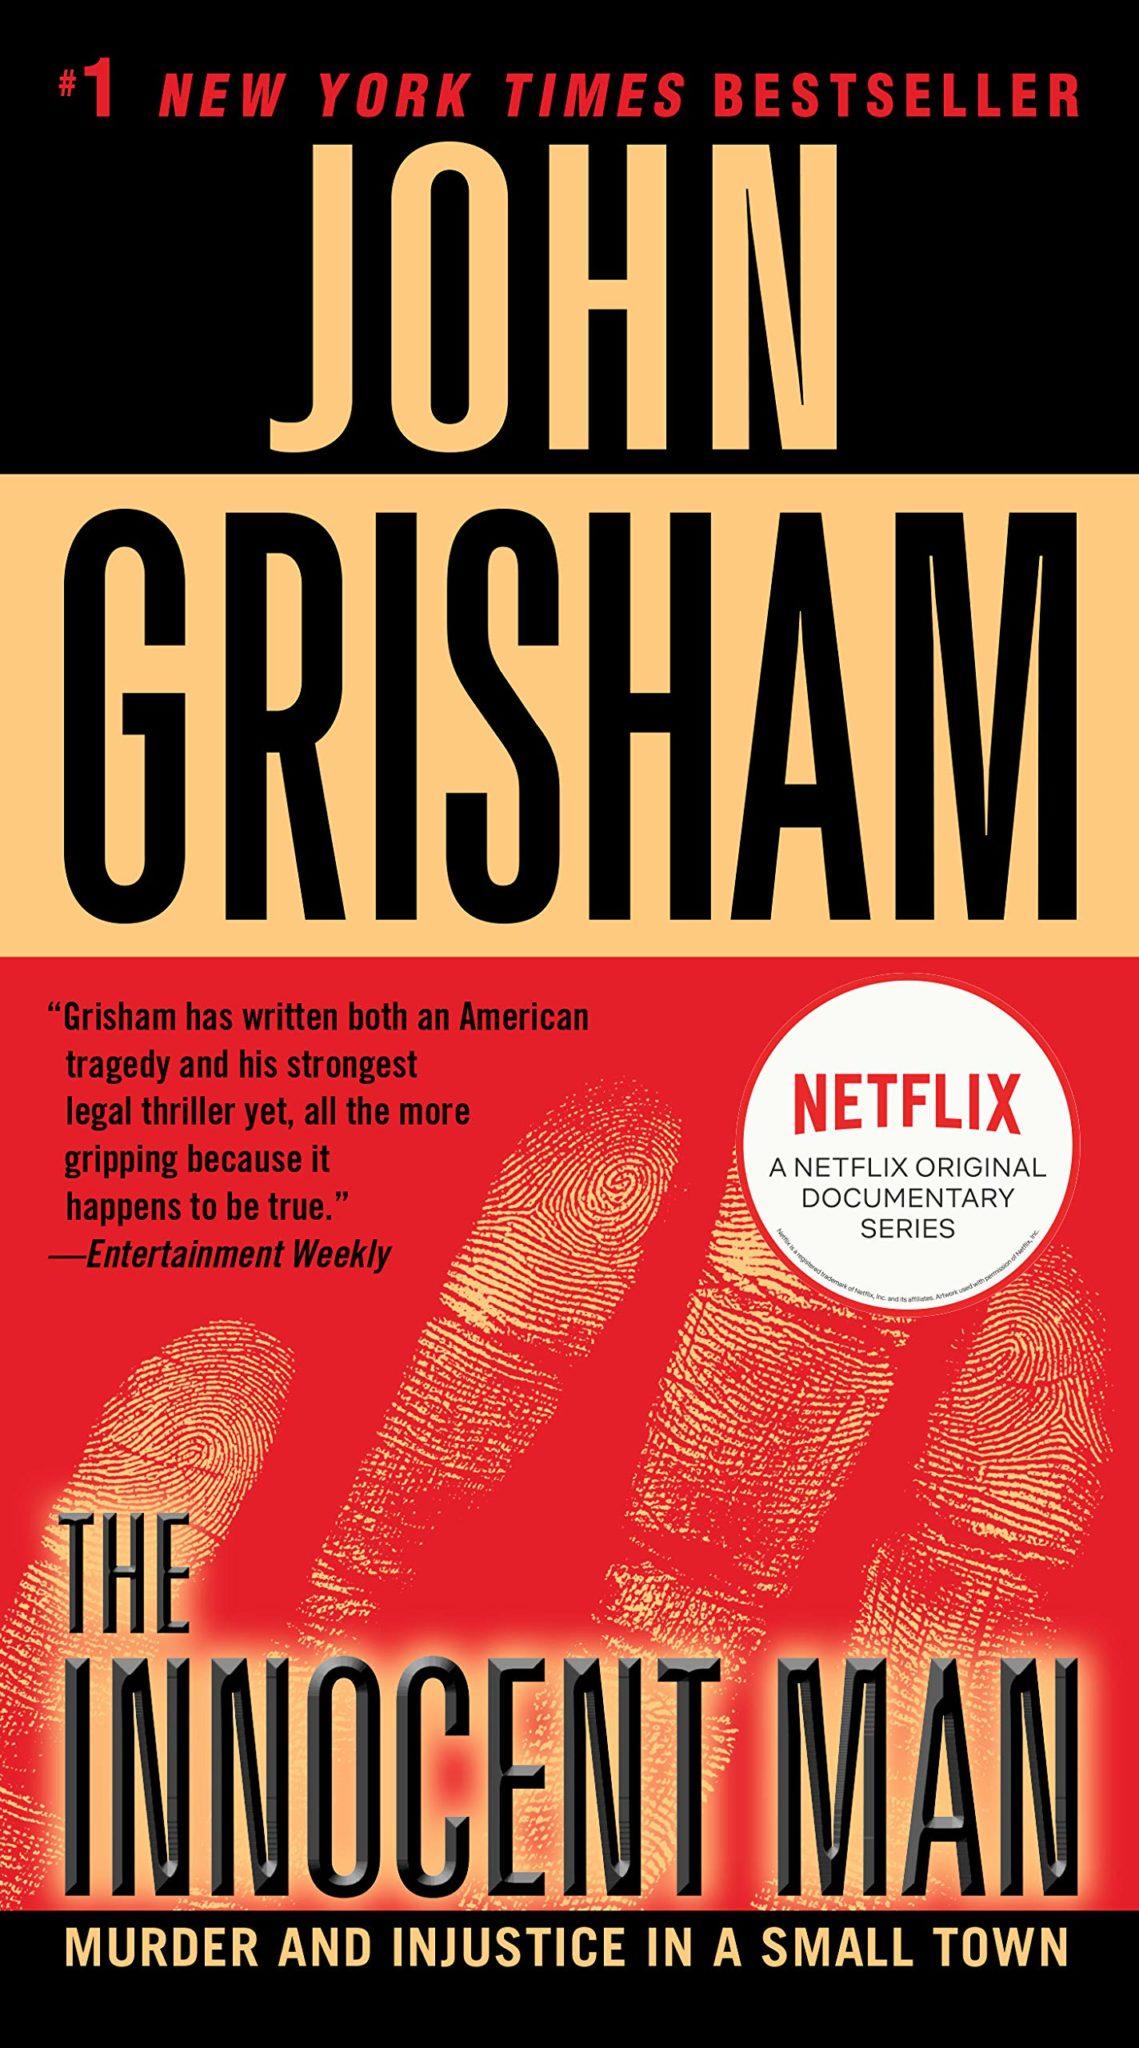 John Grisham books 20